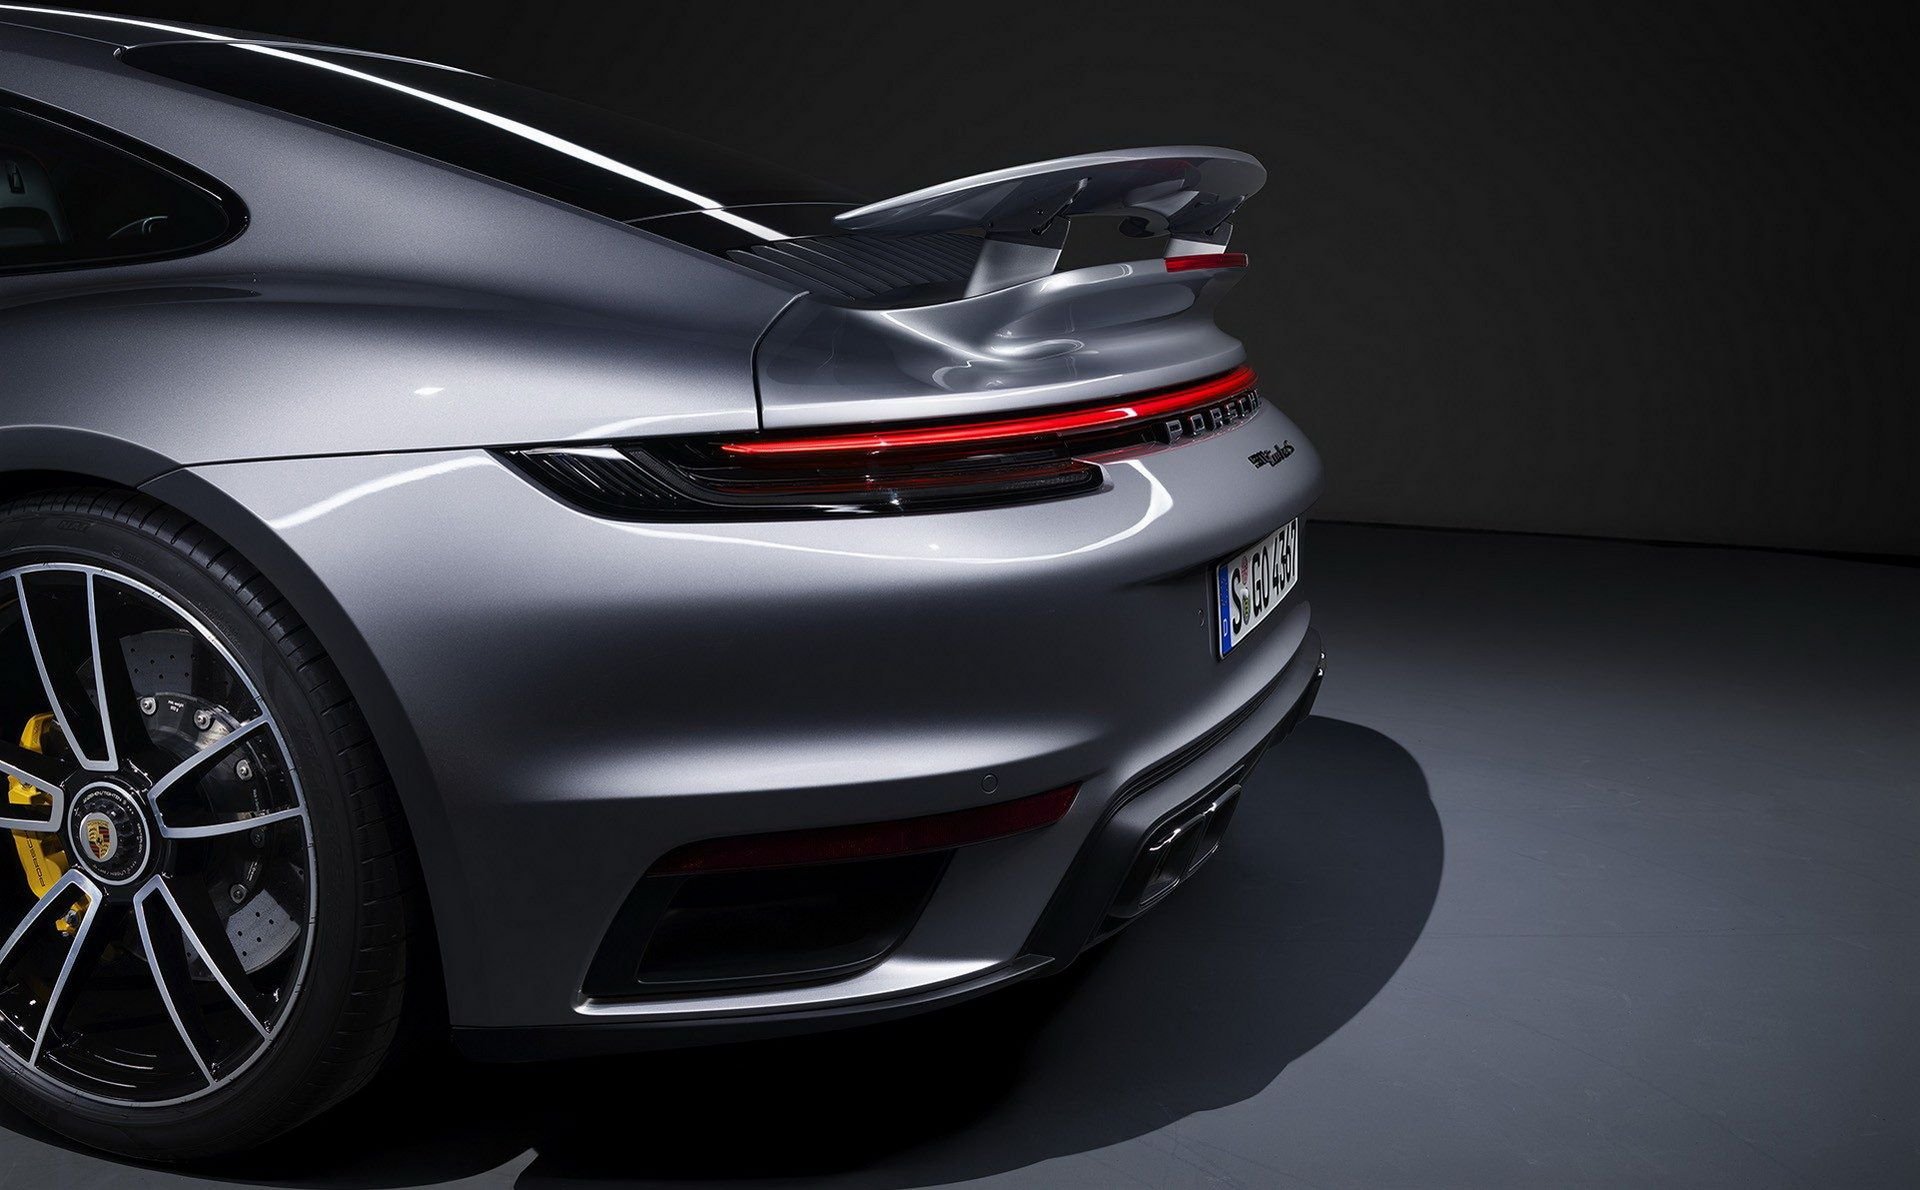 Porsche-911-Turbo-S-2020-35